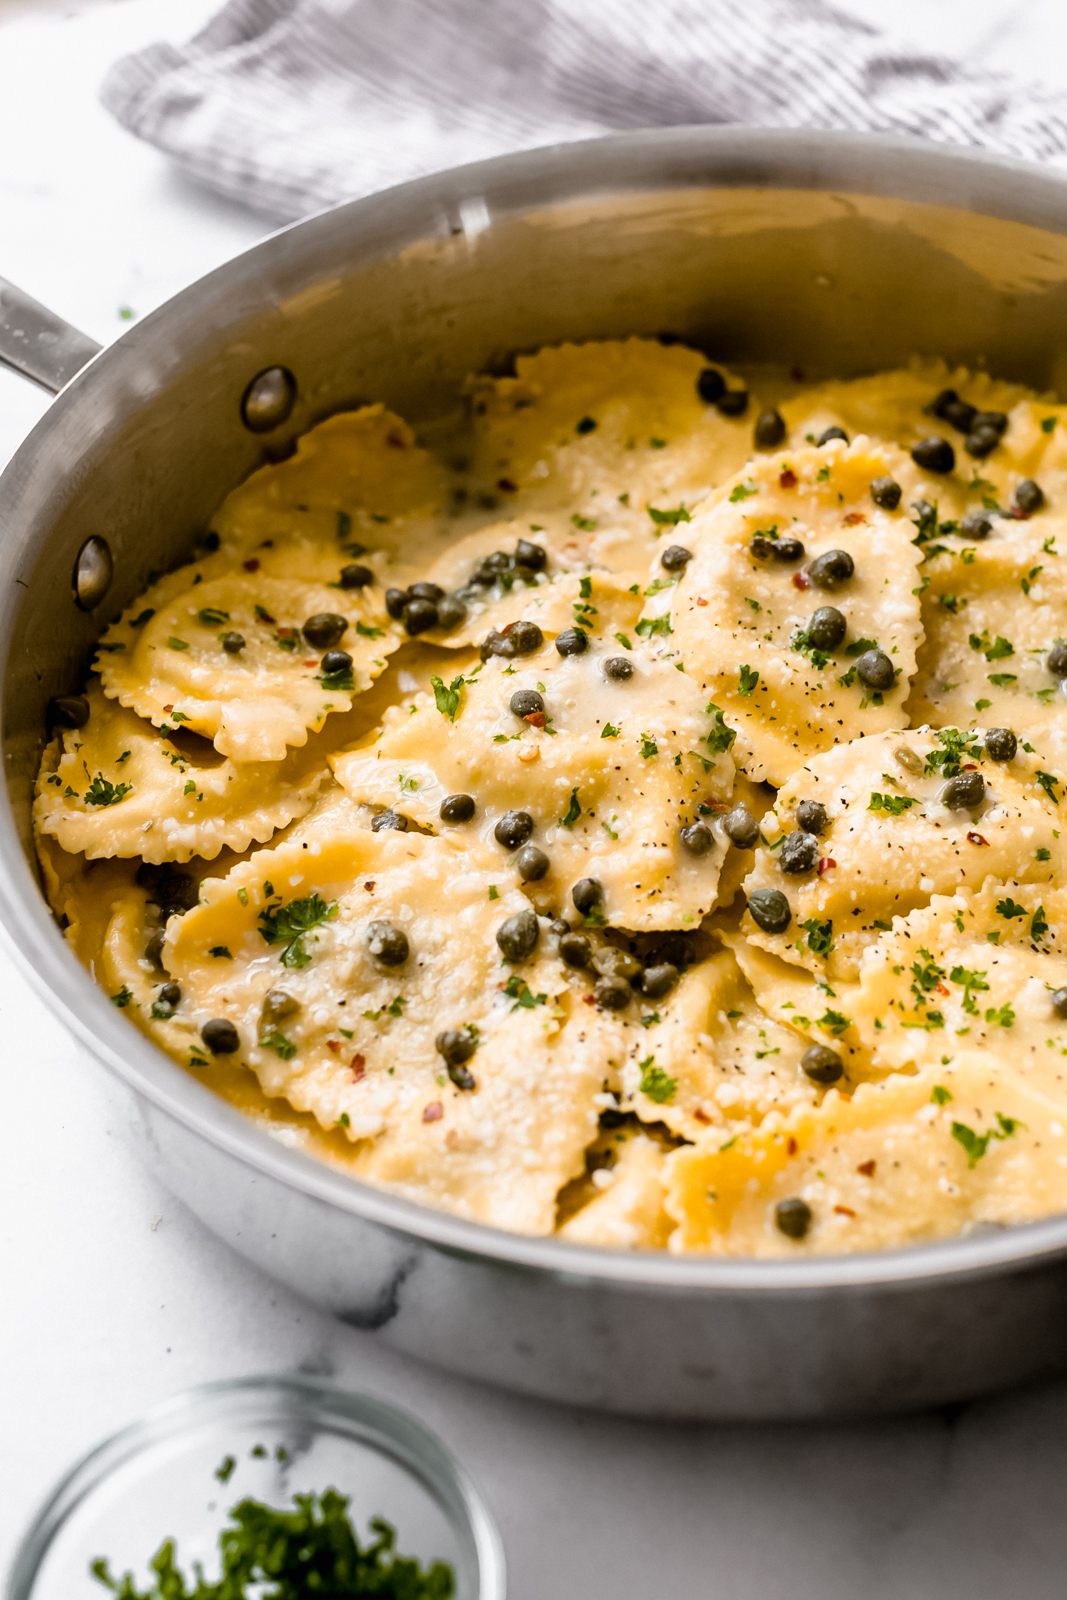 saute pan showing side shot of ravioli in piccata sauce